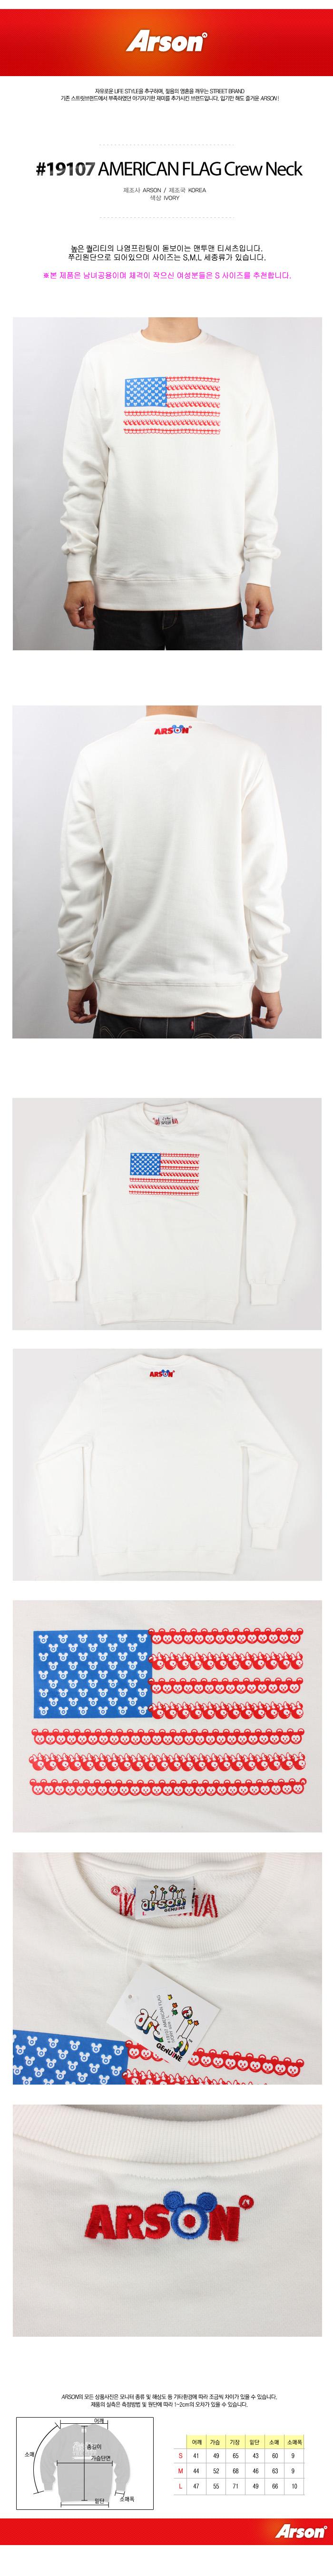 [ ARSON ] [ARSON] 19107 AMERICAN FLAG CREW NECK (Ivory)